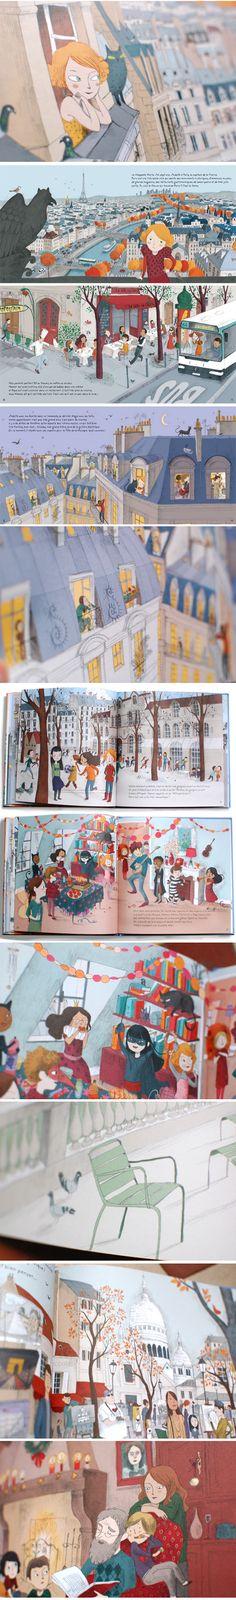 Marie de Paris - princesse camcam #childrenbook #illustration